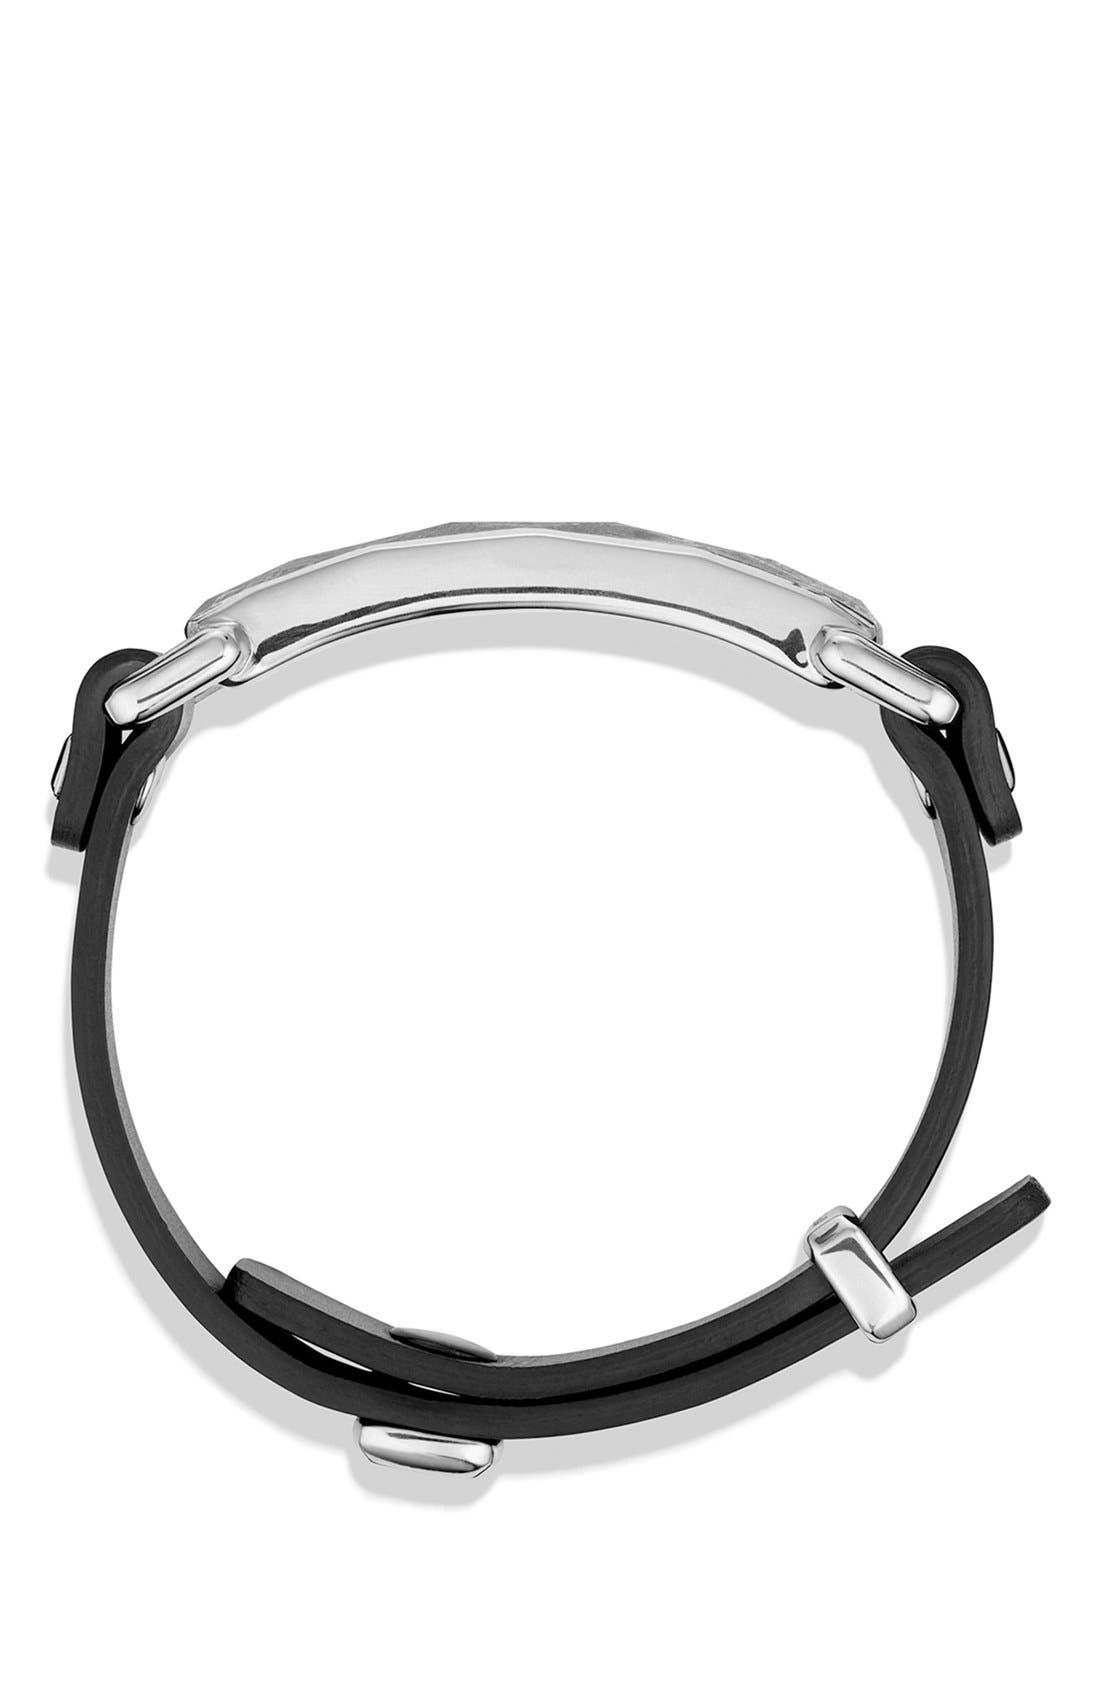 Alternate Image 2  - David Yurman 'Meteorite' Leather ID Bracelet in Black